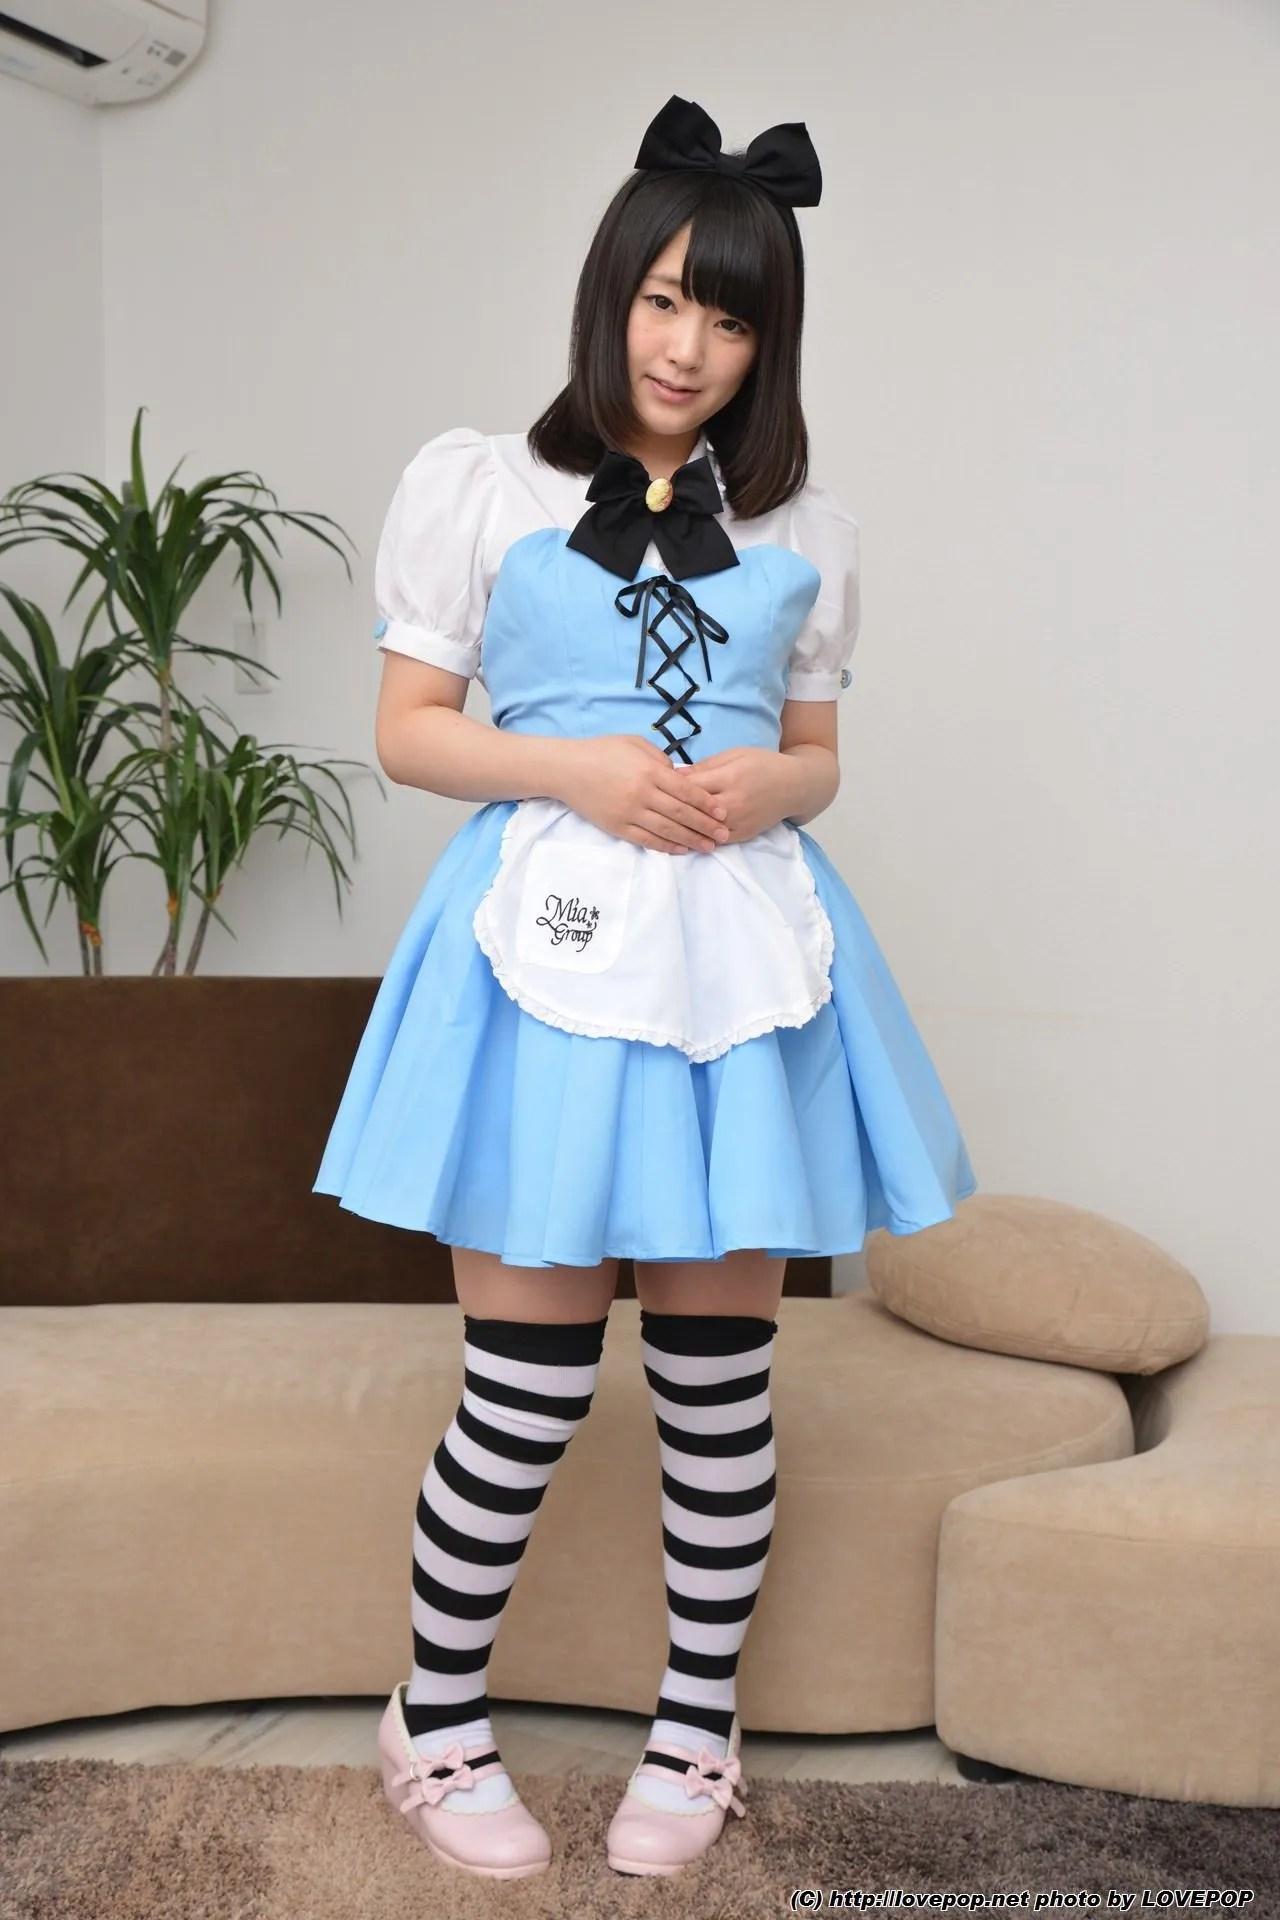 [LovePop] Tsuna Kimura 木村つな Maid Set03 写真集[65P]插图(1)